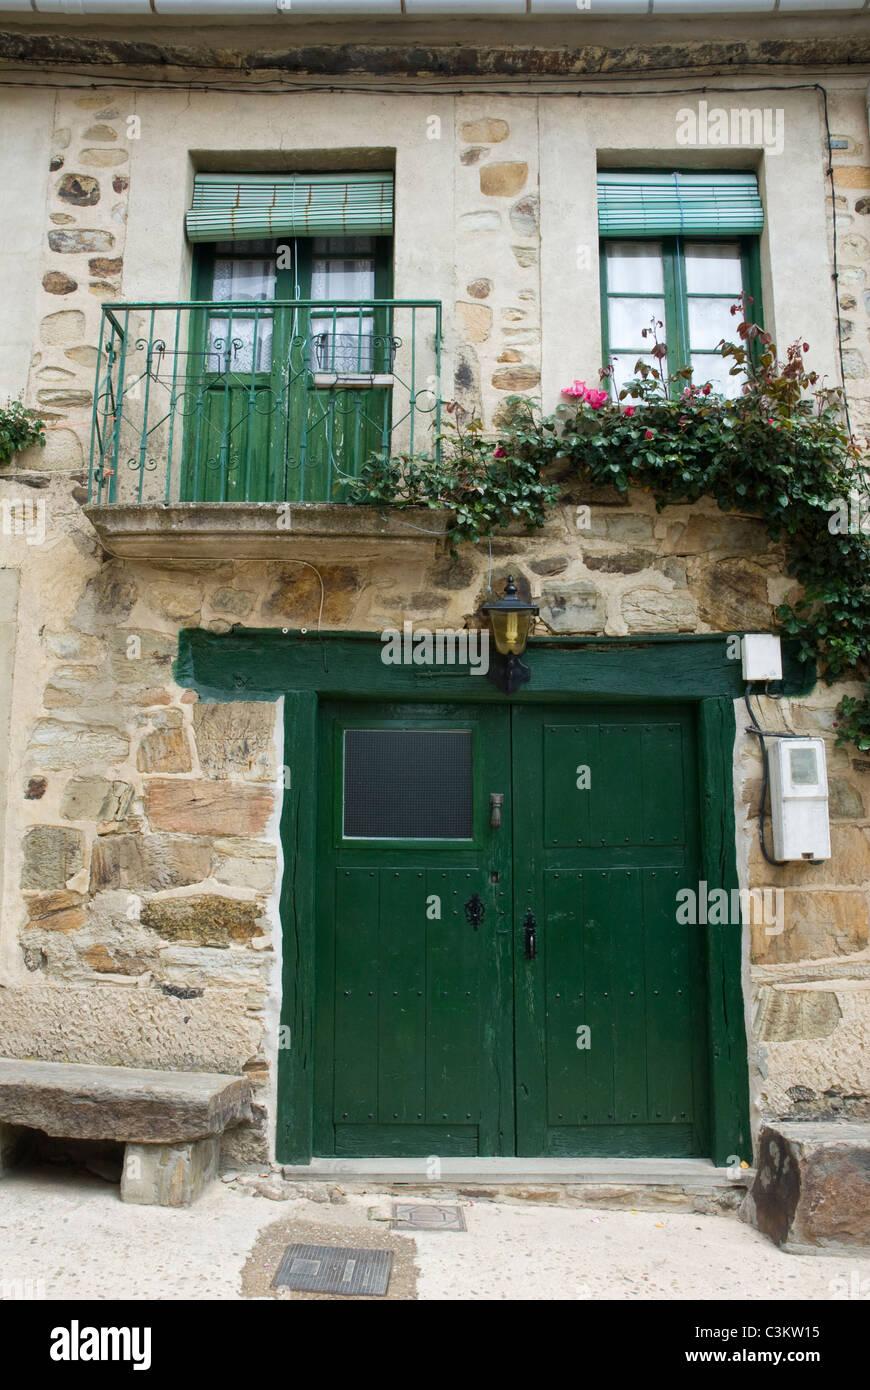 Rustic house along the pilgrimage route, Camino de Santiago, Northern Spain - Stock Image